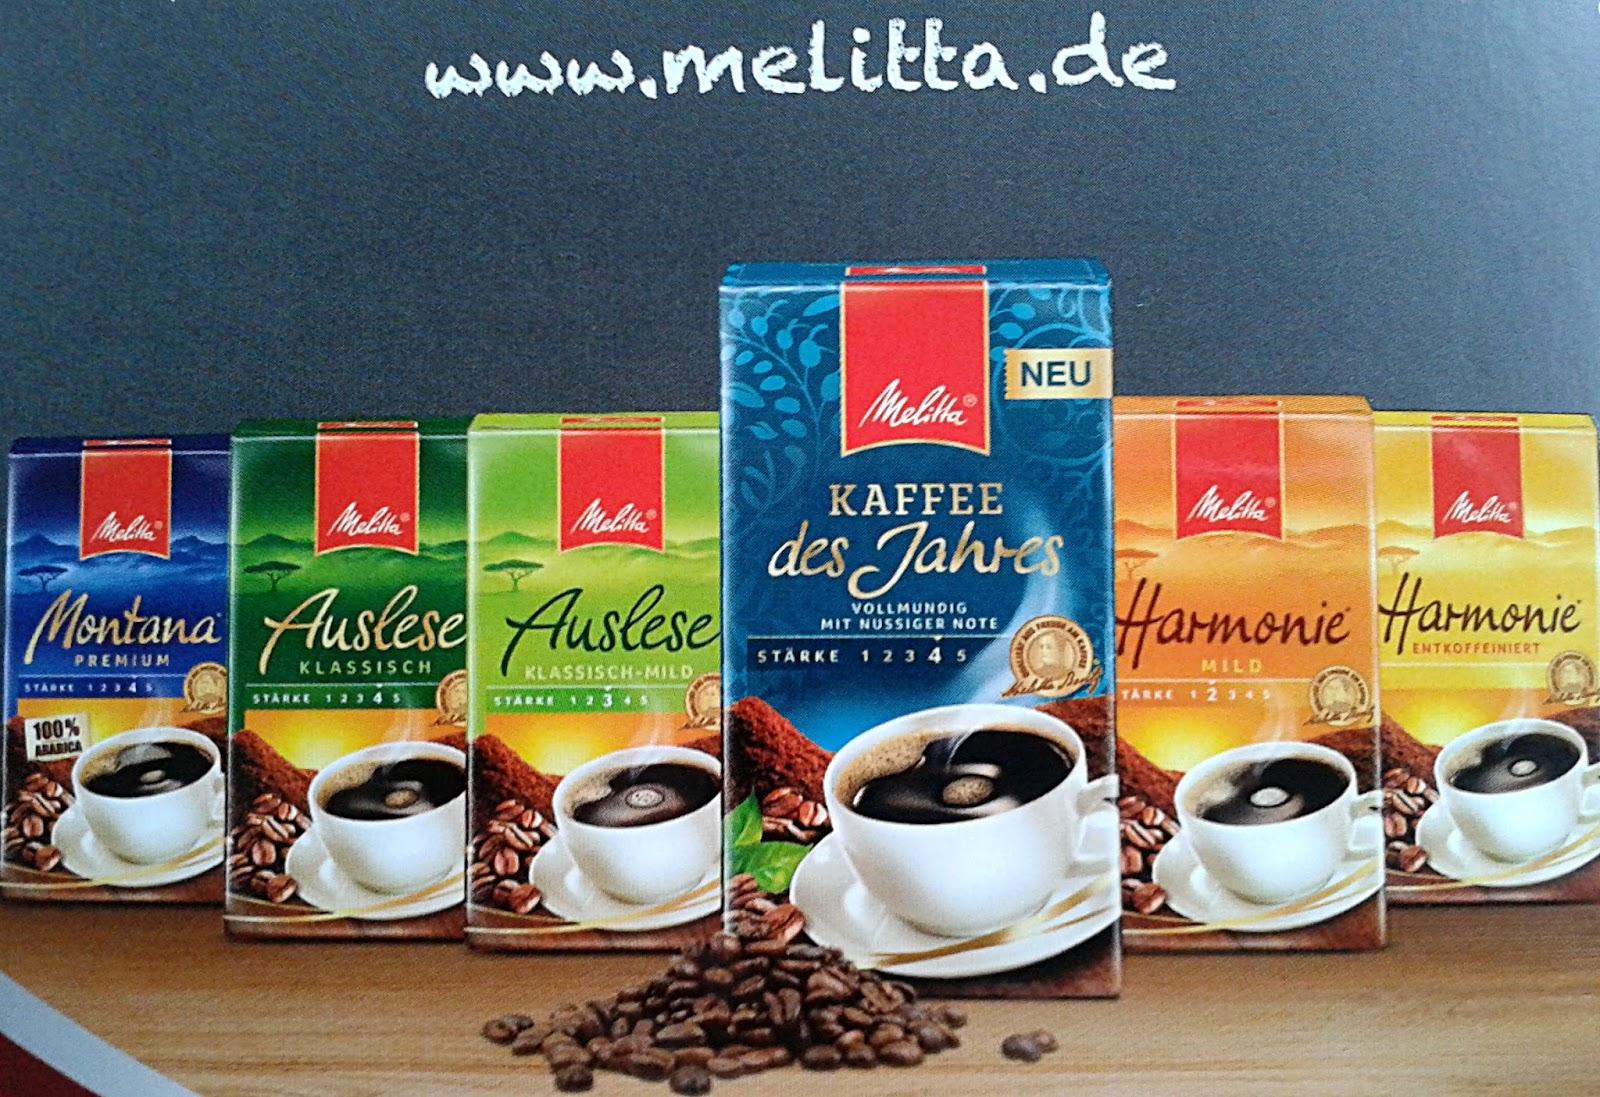 kaffee gratis testen